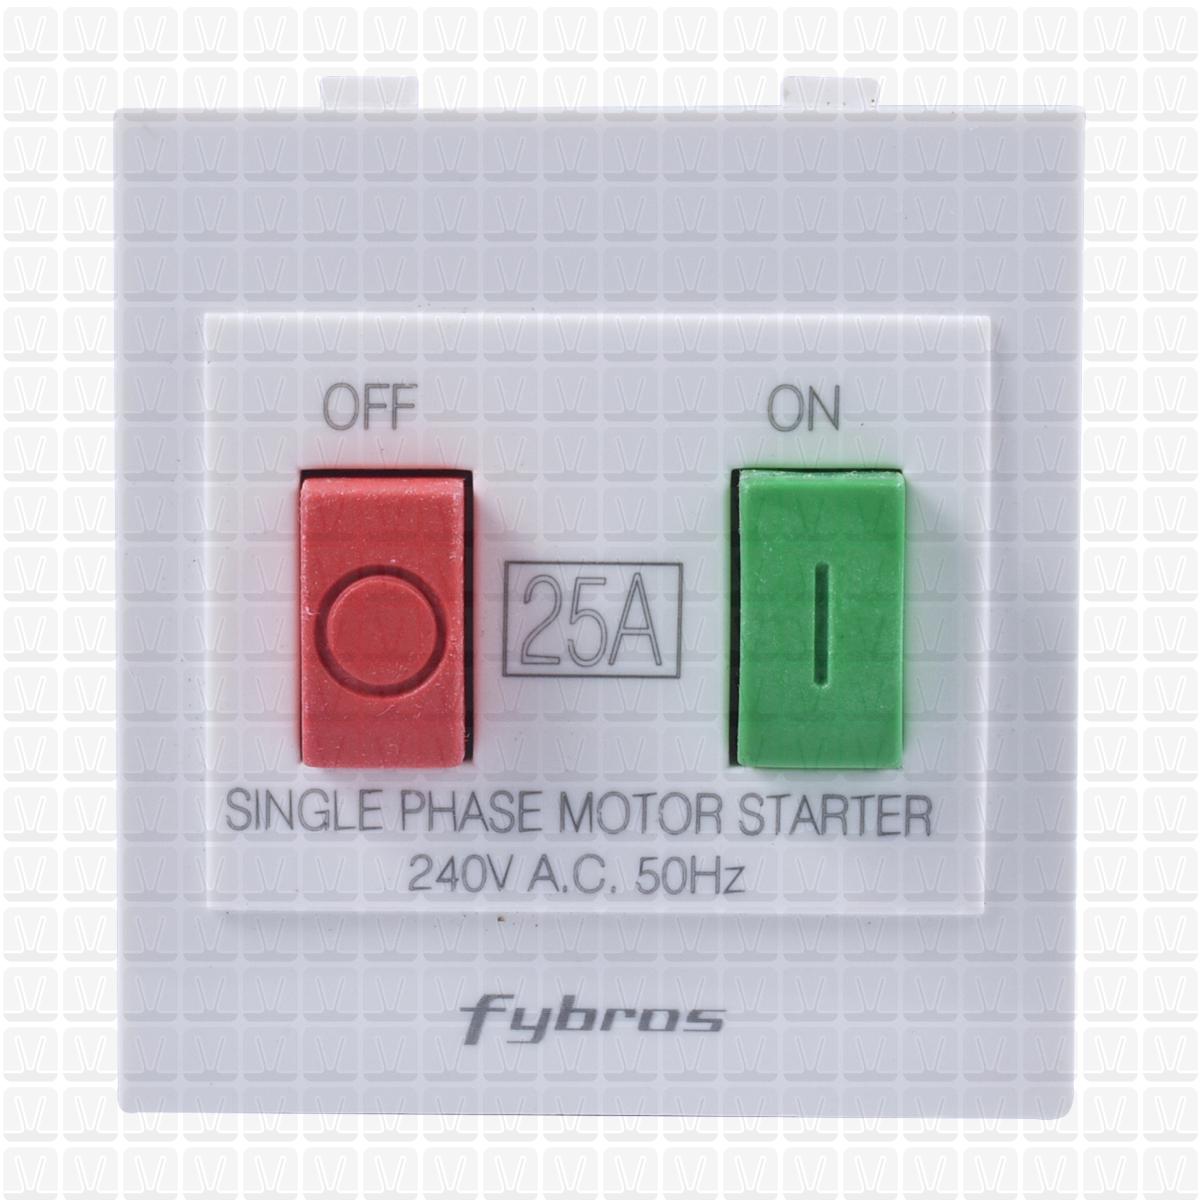 Fybros Woodem Motor Starter 2m Vardhman Shop Single Phase